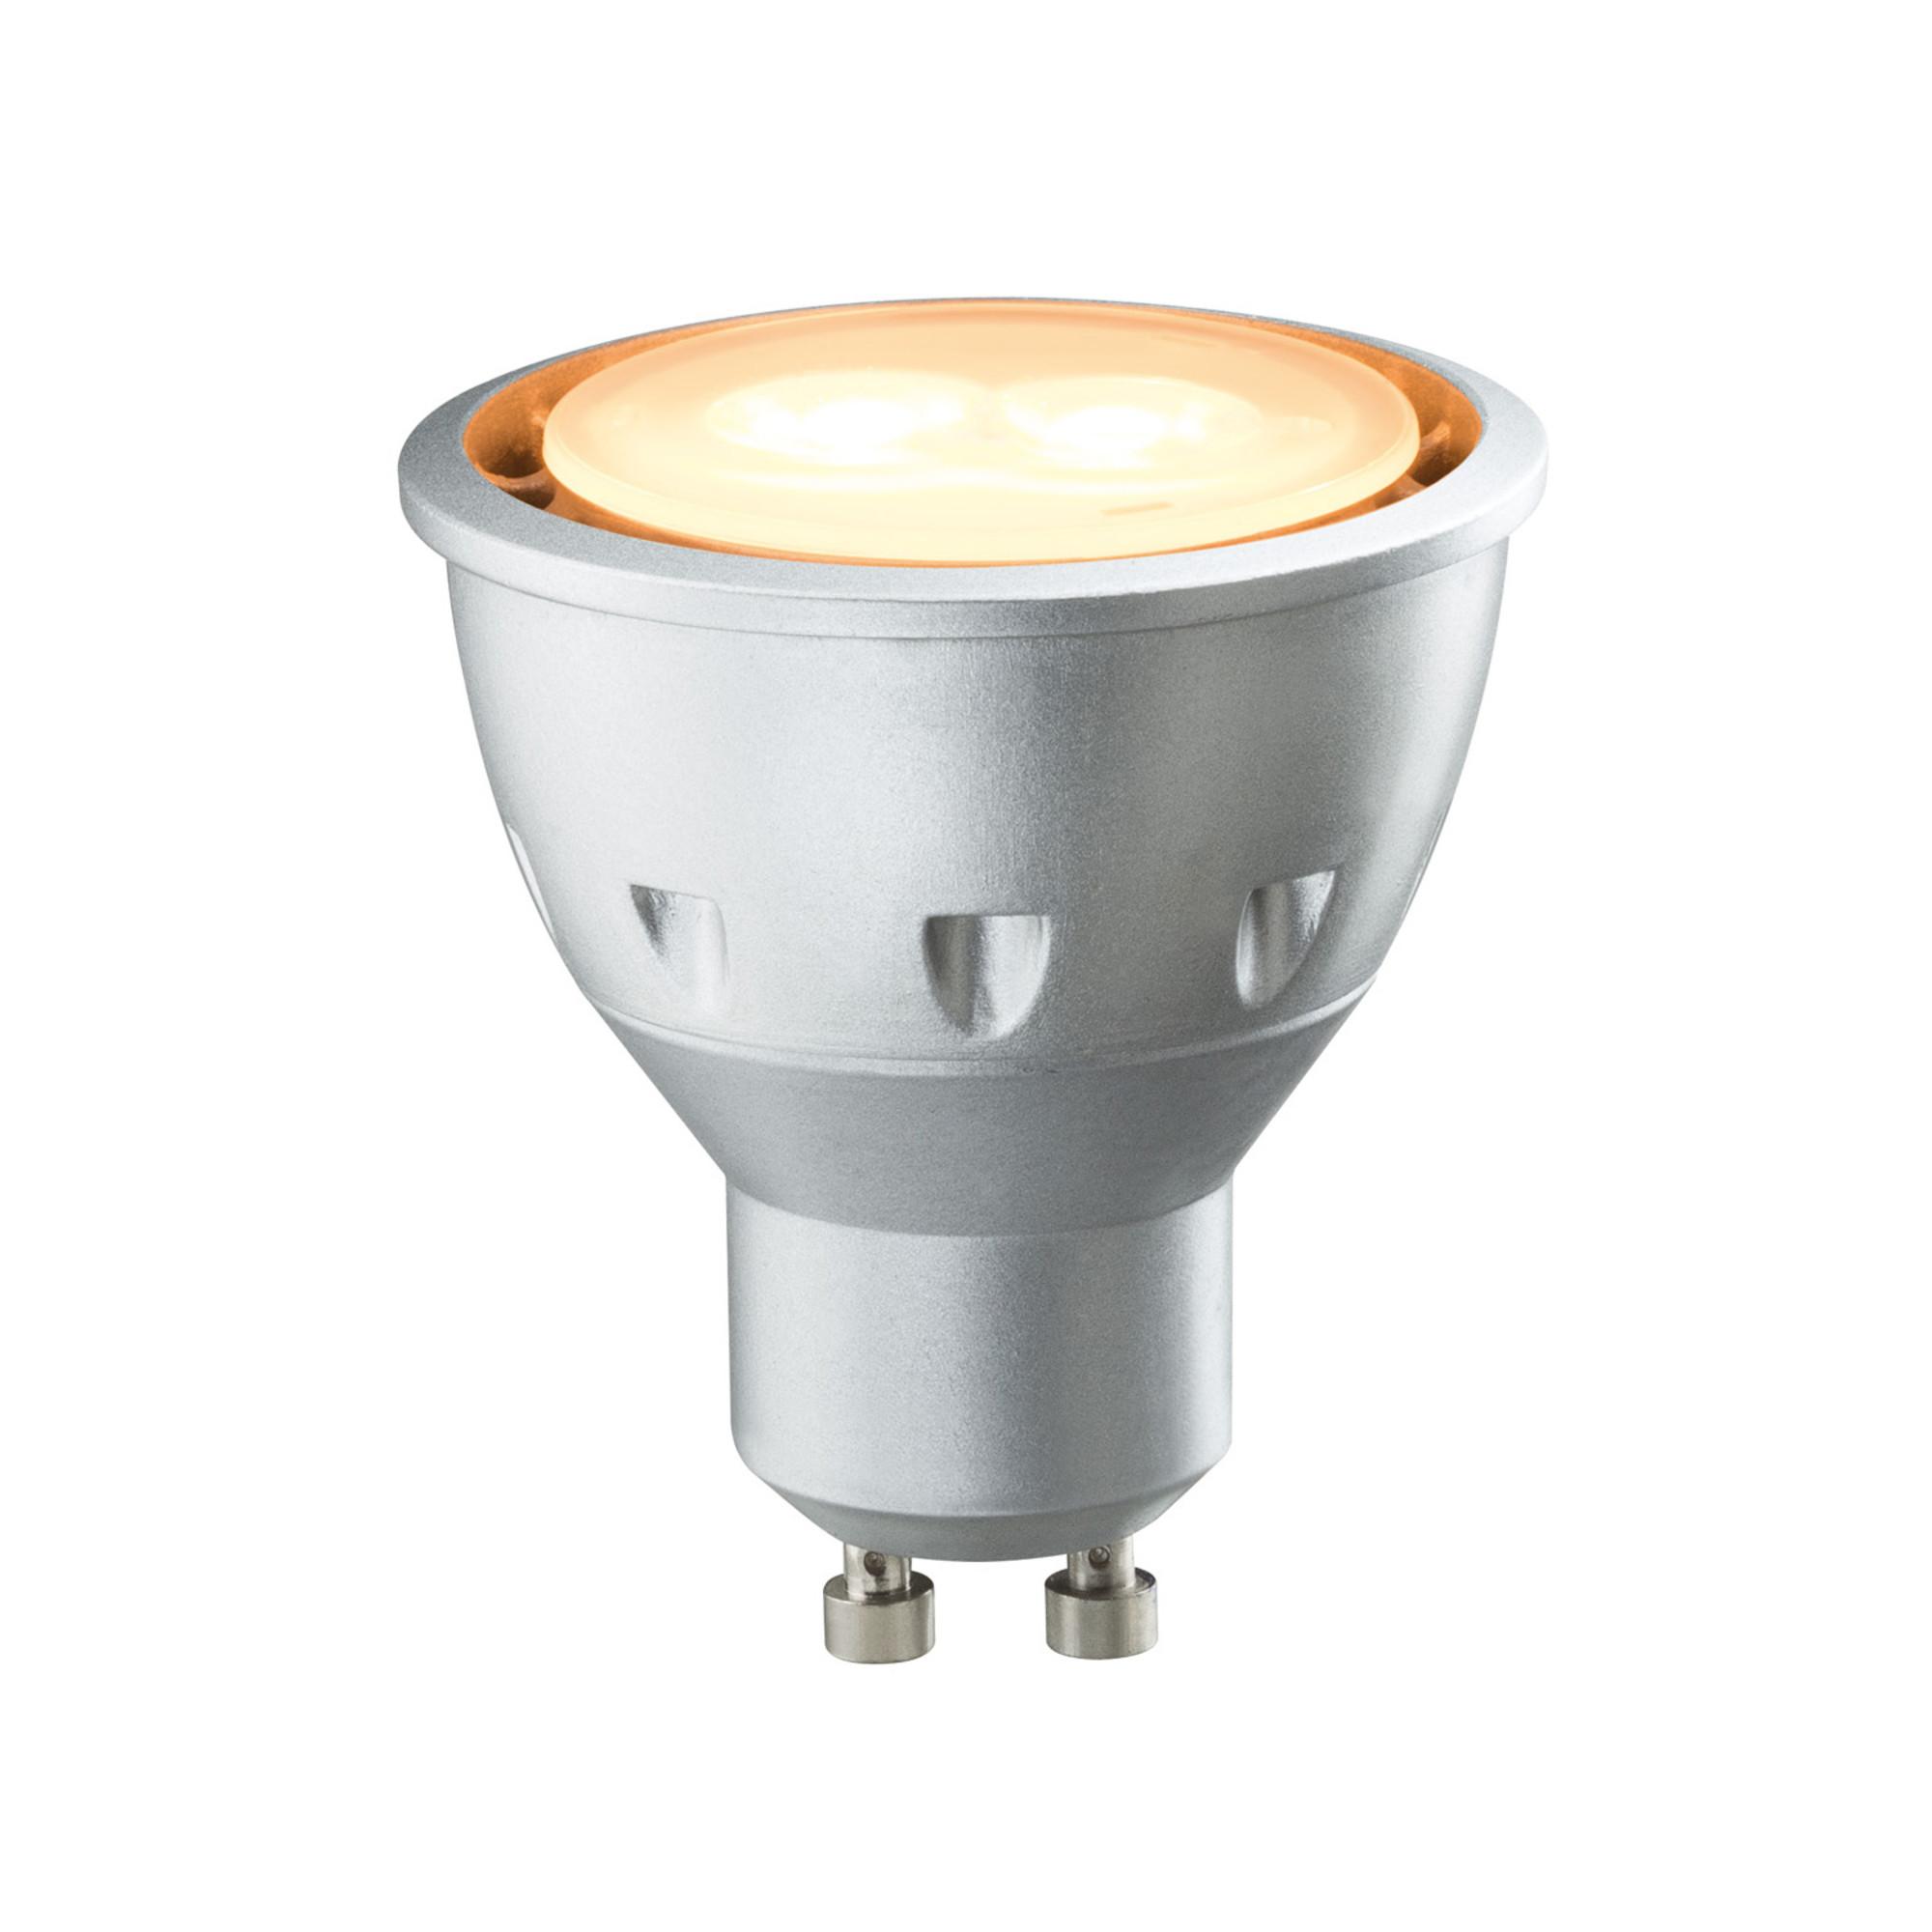 Лампа светодиодная Paulmann 28183 GU10 170 Лм теплый свет